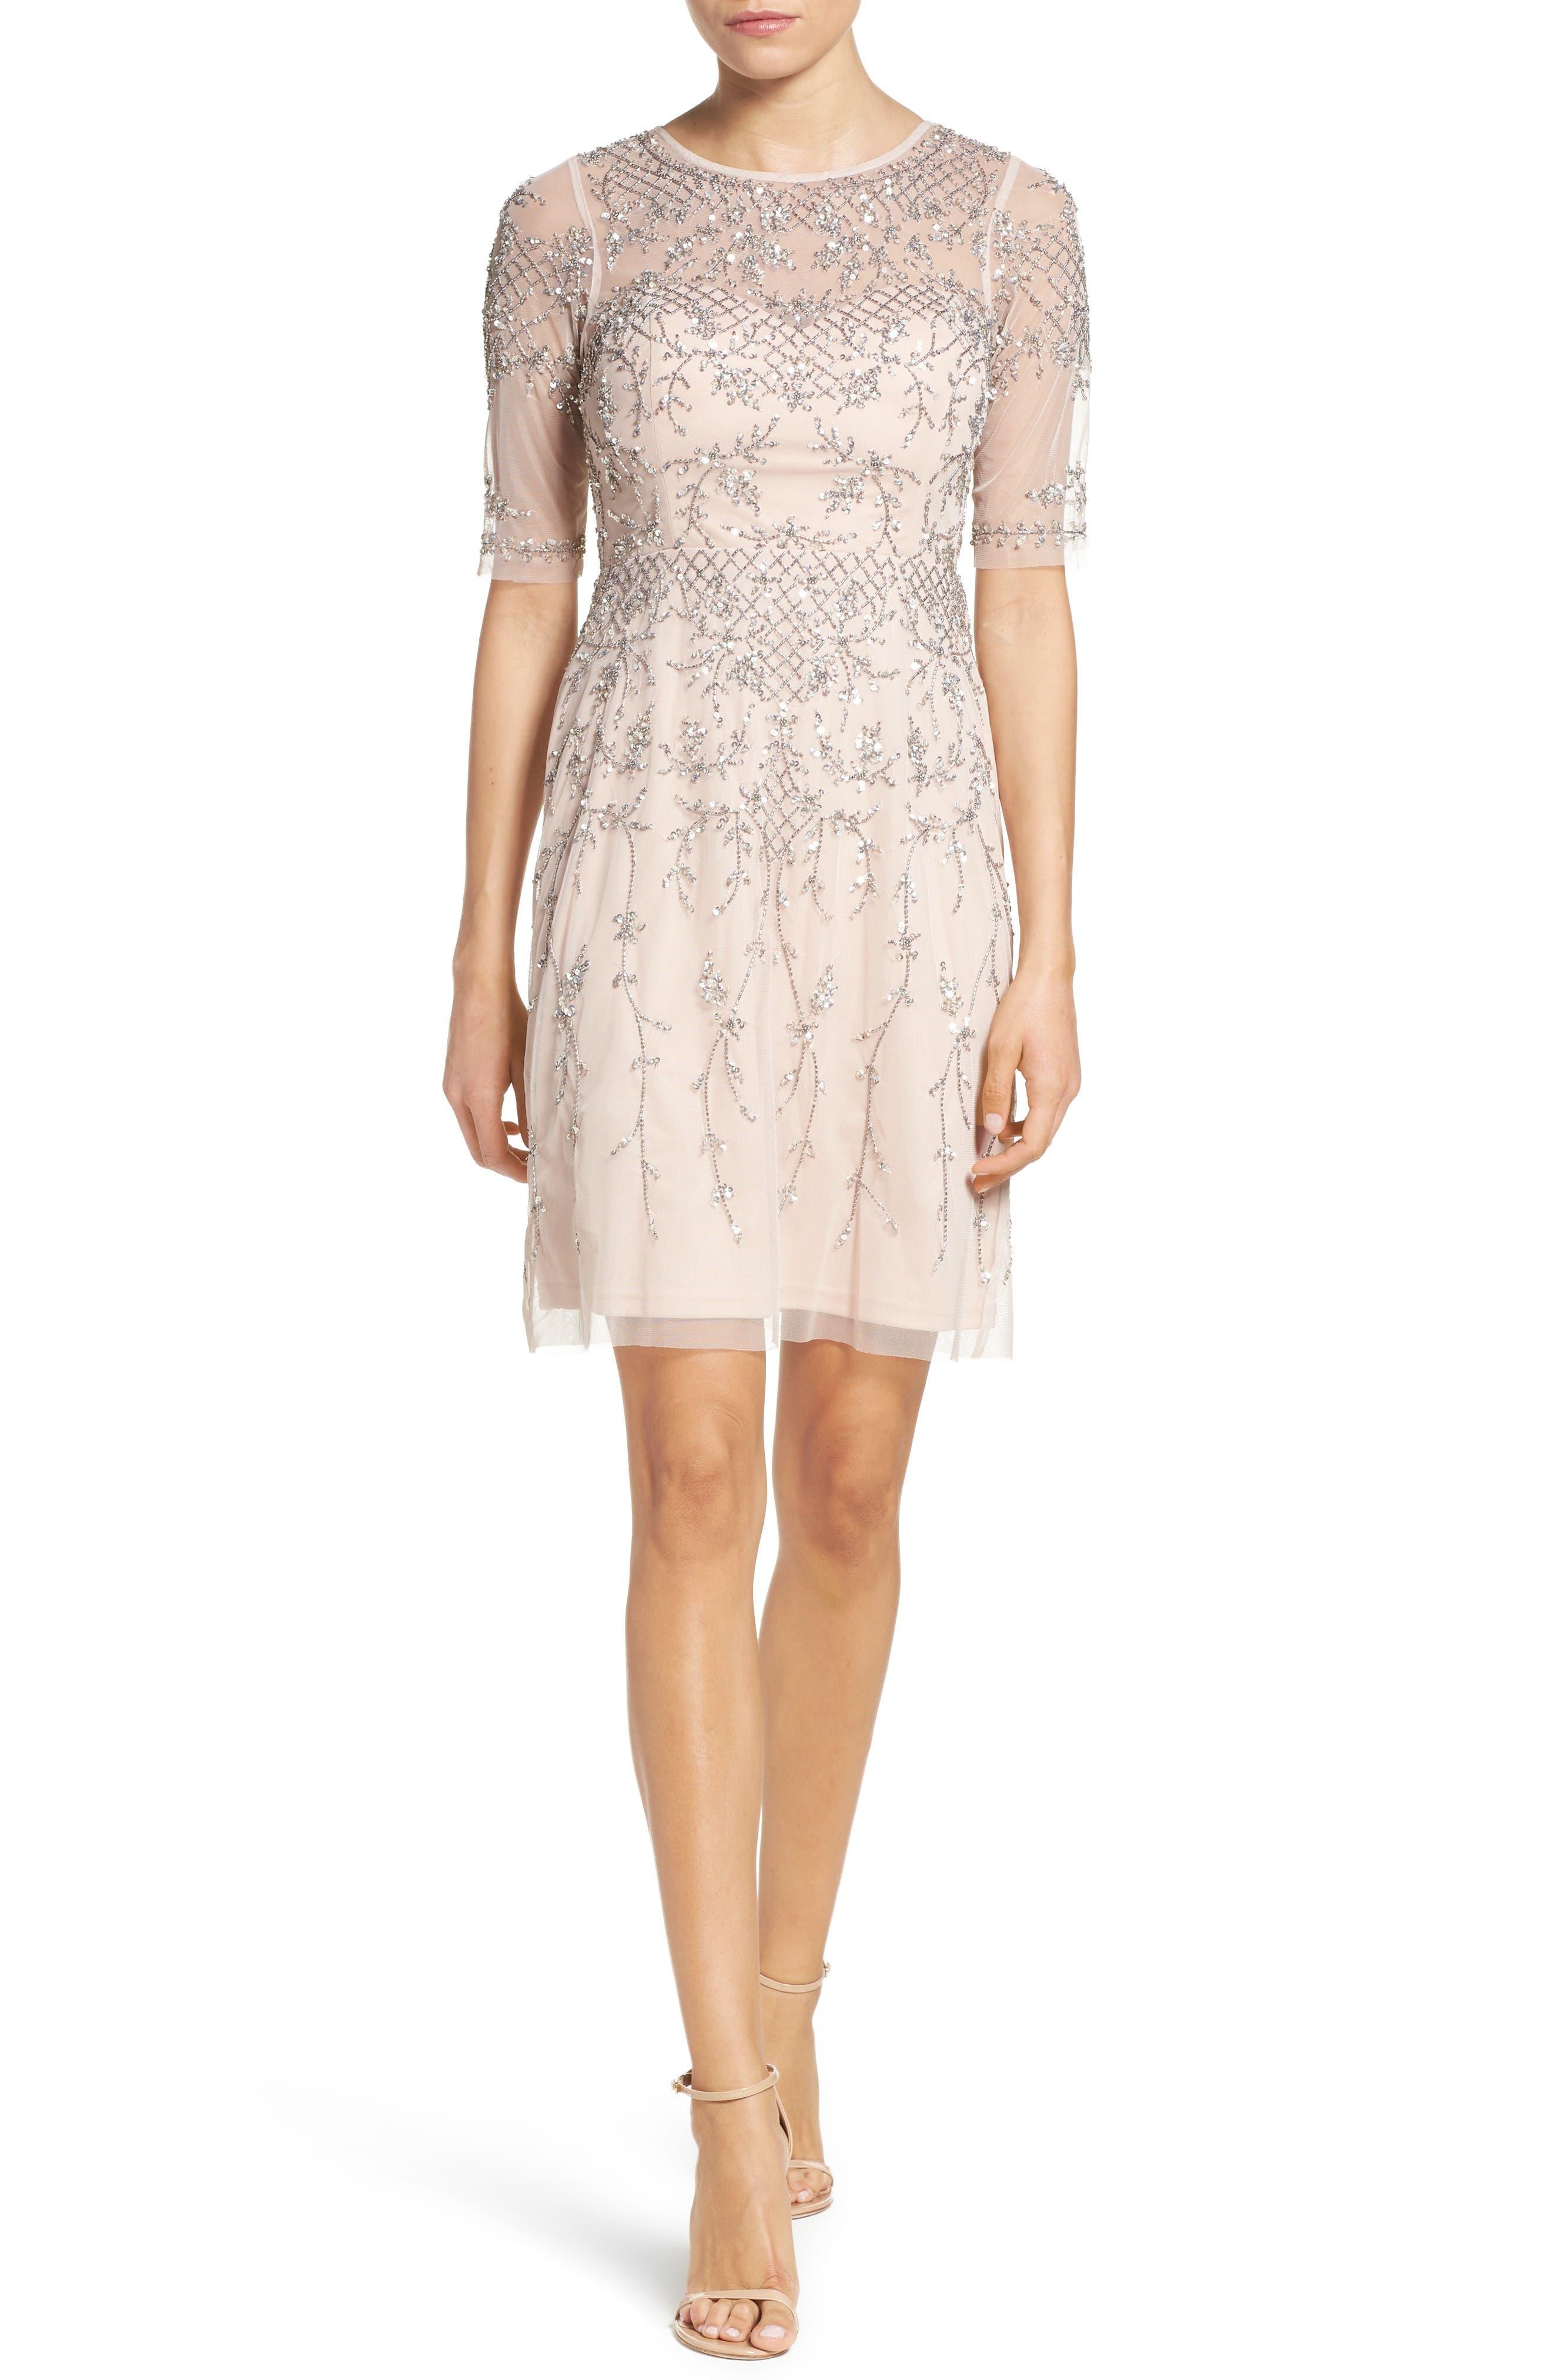 Alternate Image 1 Selected - Adrianna Papell Embellished Fit & Flare Dress (Regular & Petite)